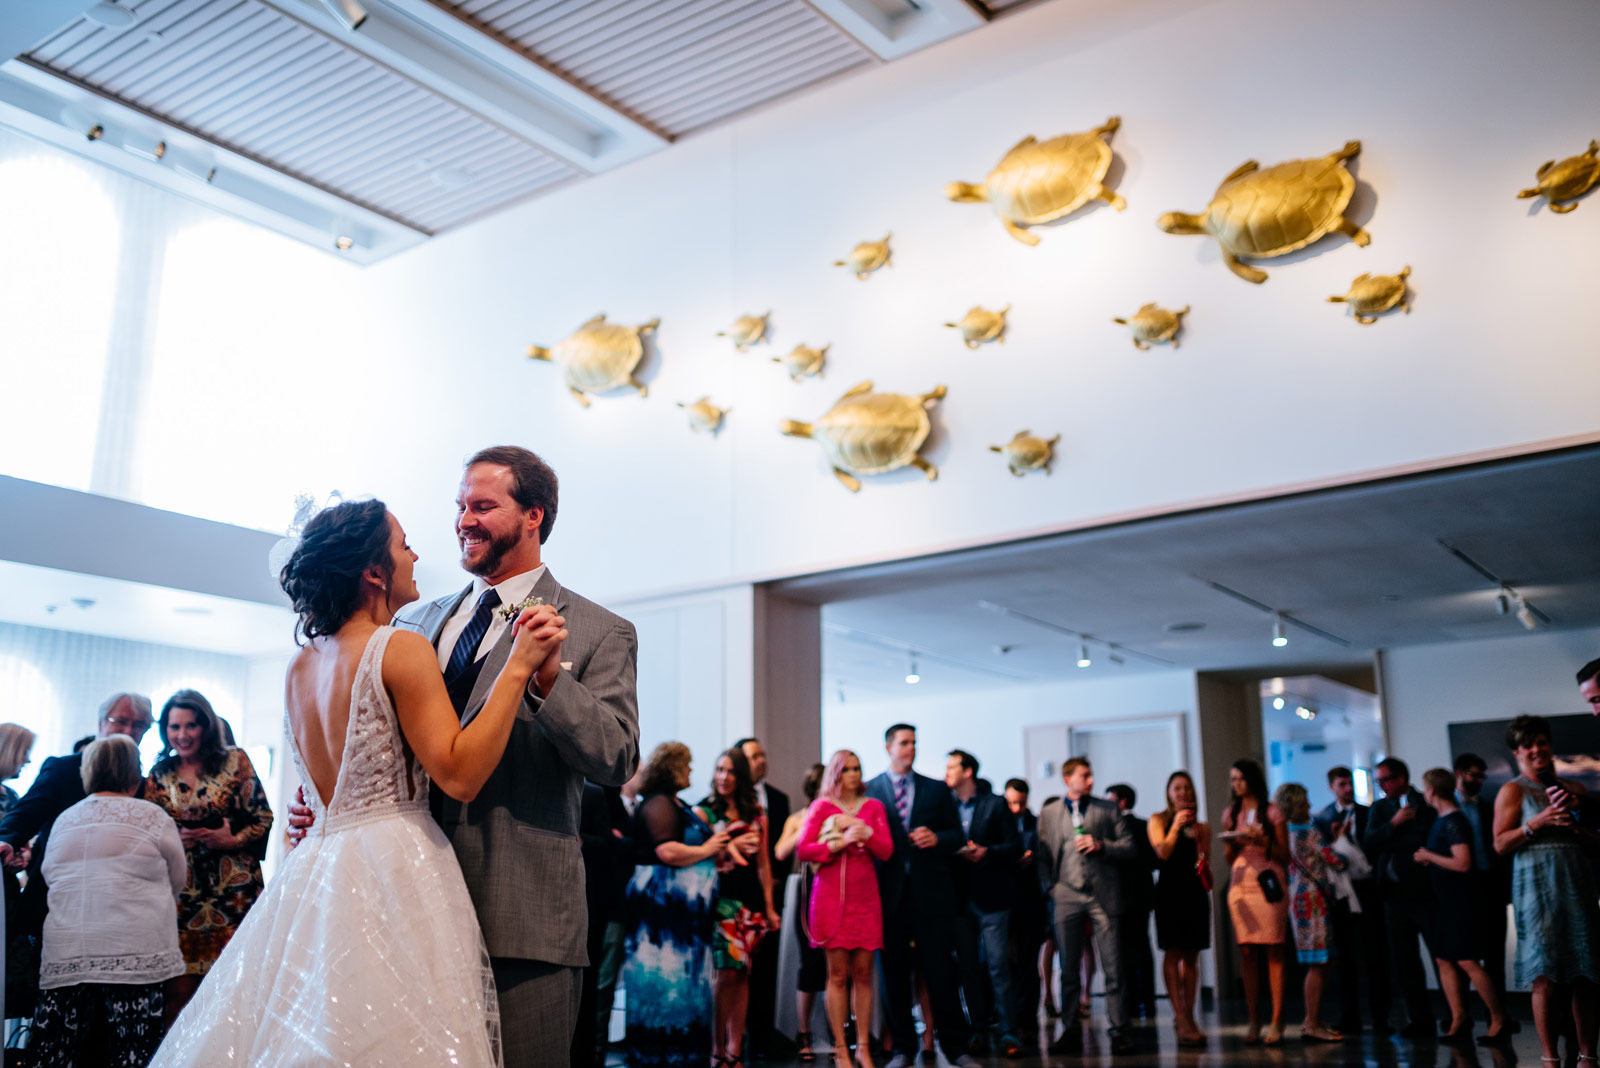 21c museum hotel lexington wedding